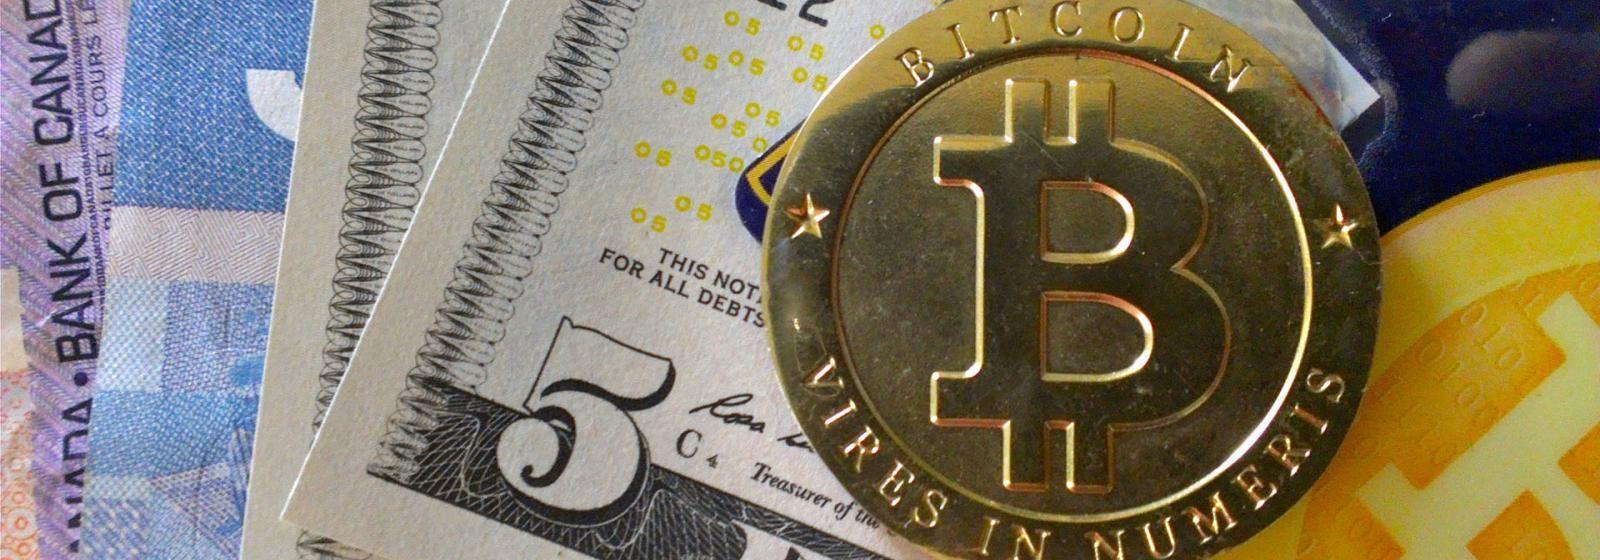 asic už bitcoin bitcoin pripažinta valiuta